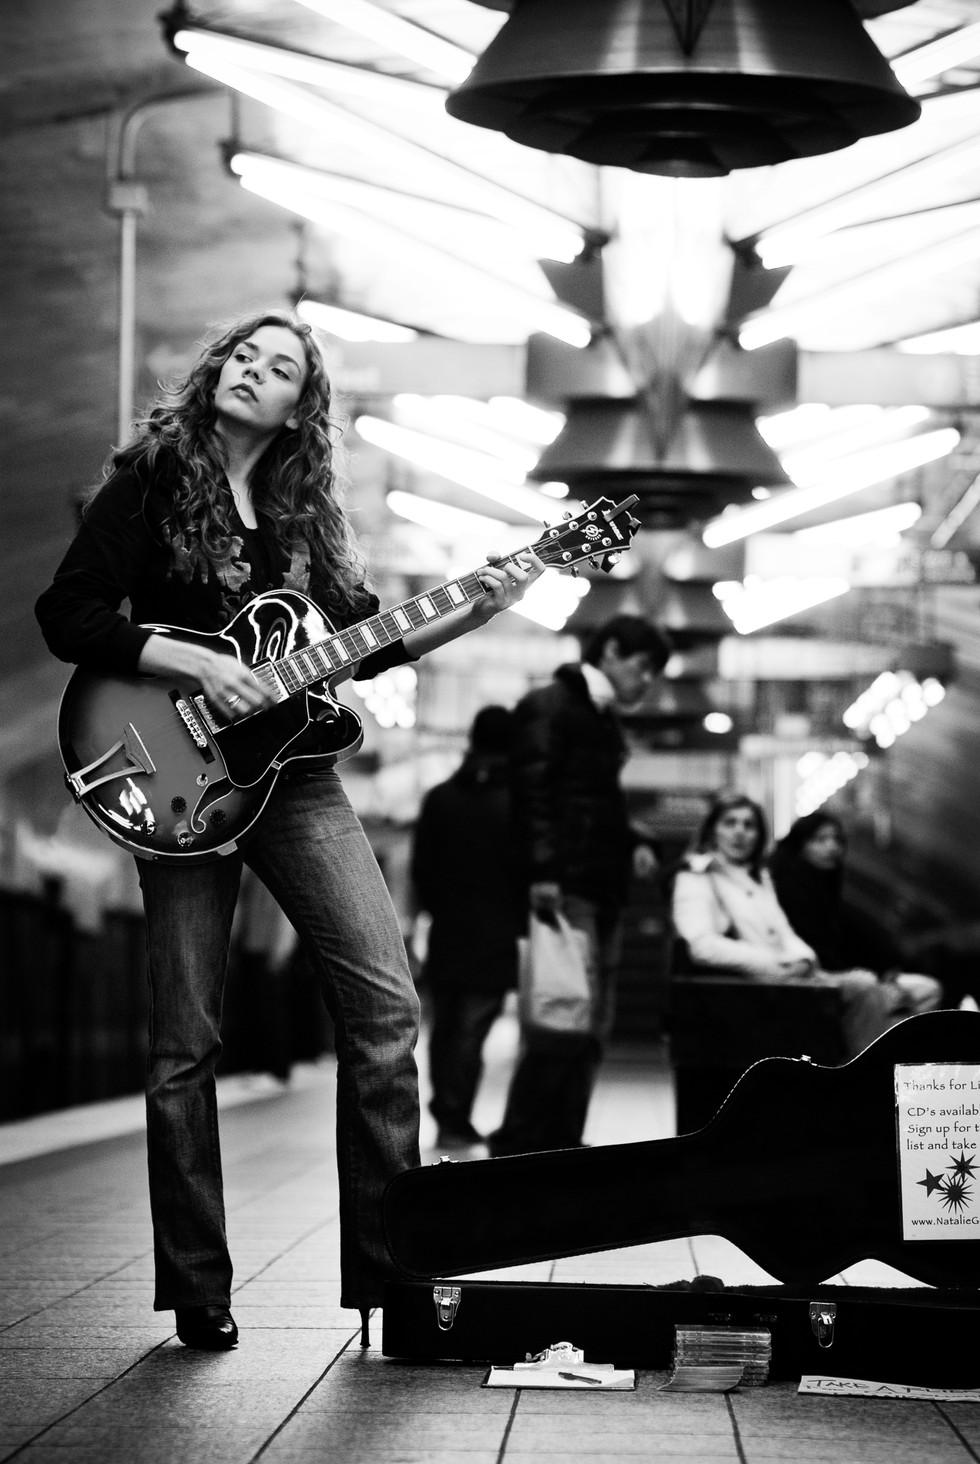 Natalie Gelman Subway Nov 24 07 347 EDIT